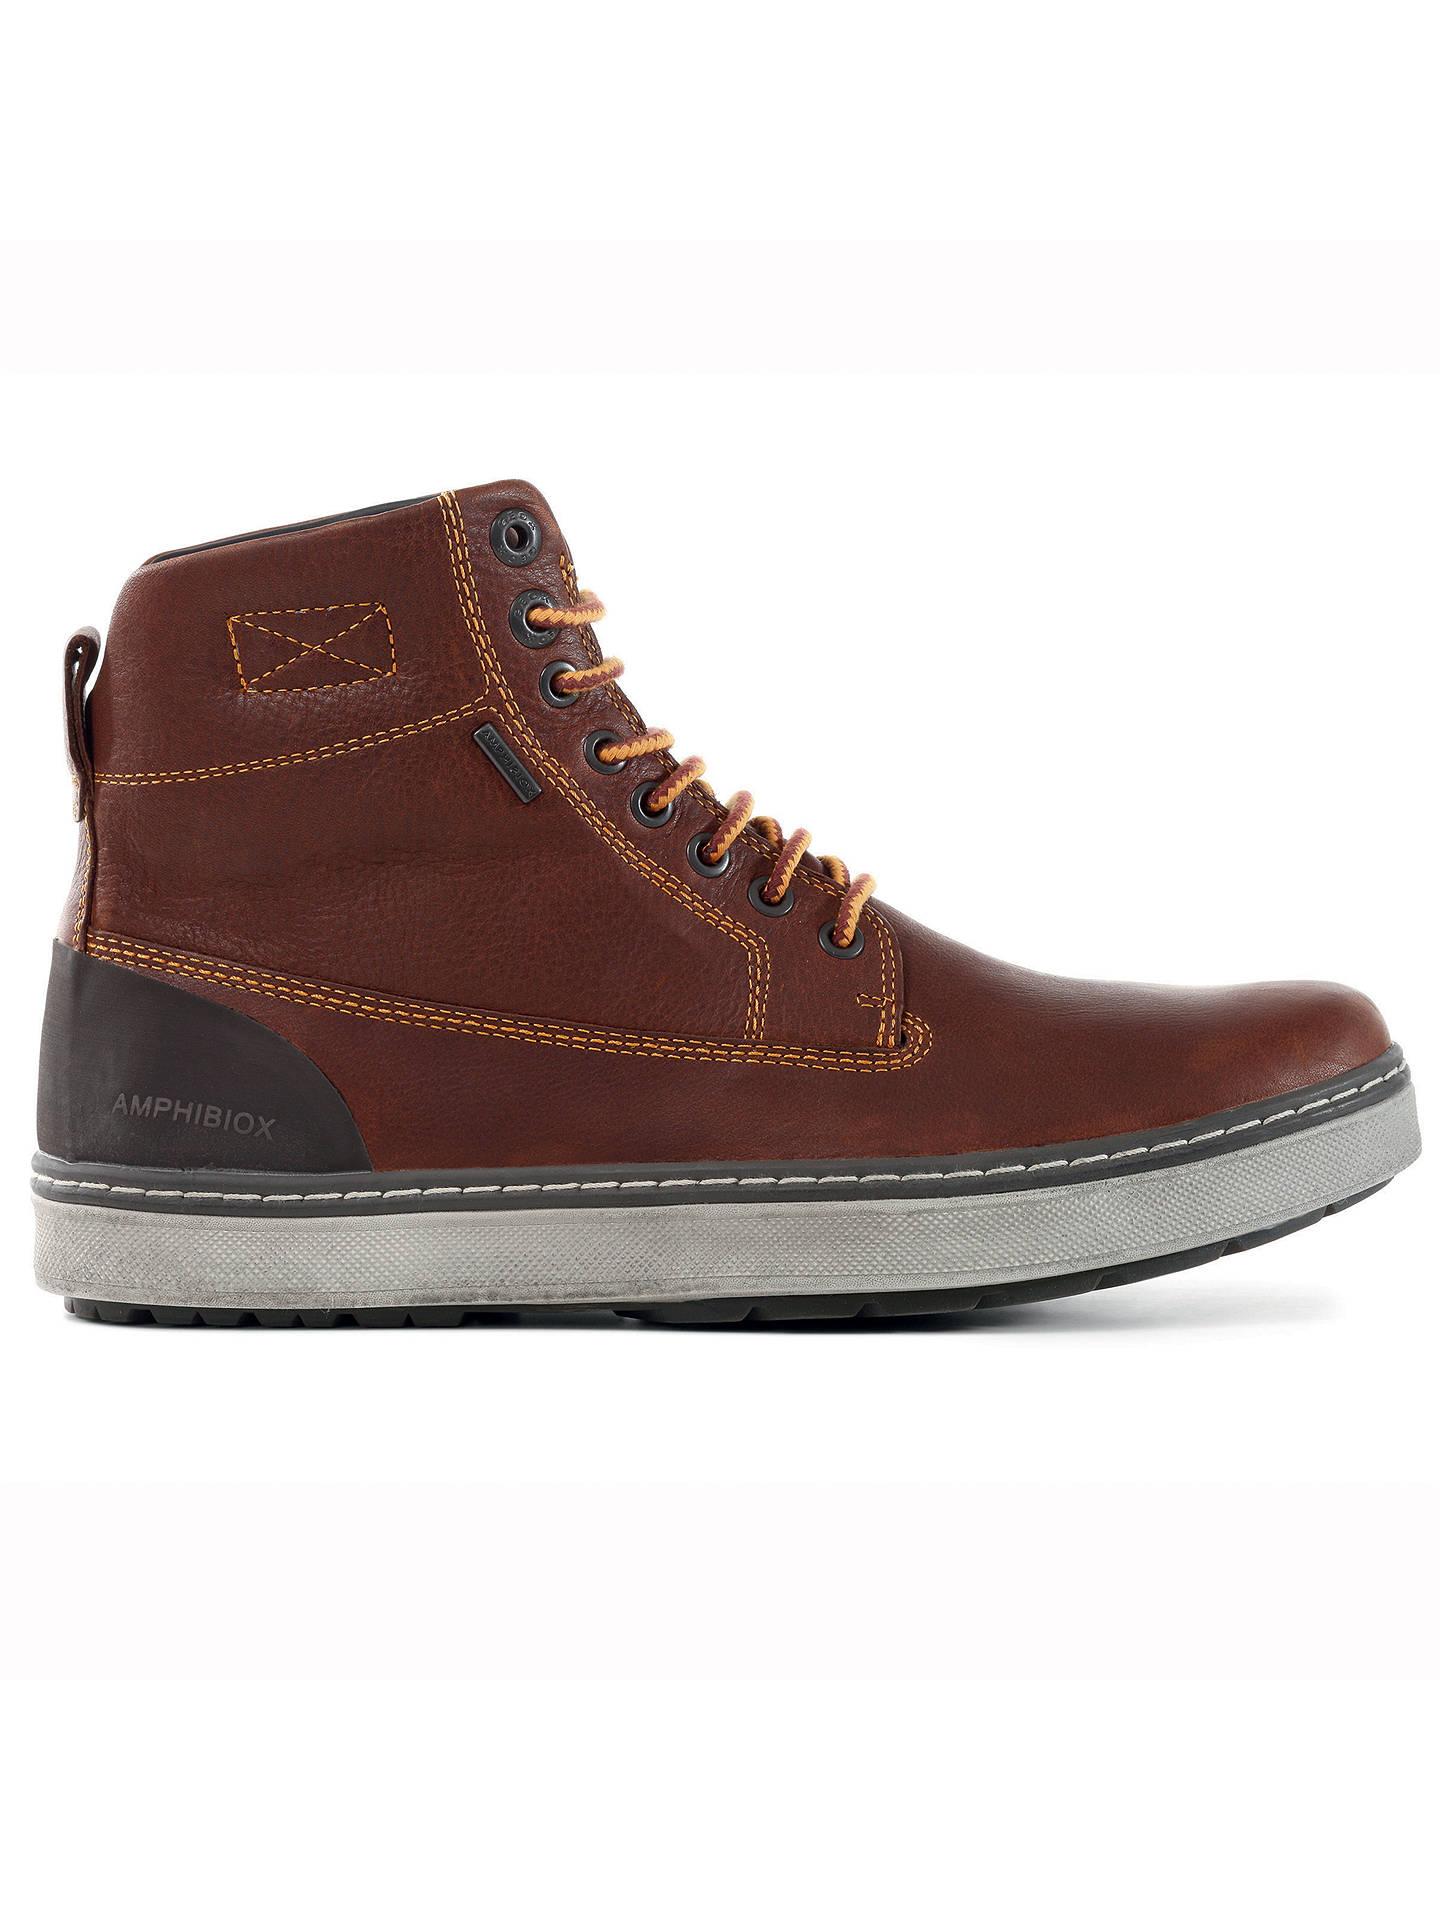 estético Mula Cuota de admisión  Geox Mattias Hi-Top ABX Waterproof Leather Boots, Light Brown at John Lewis  & Partners